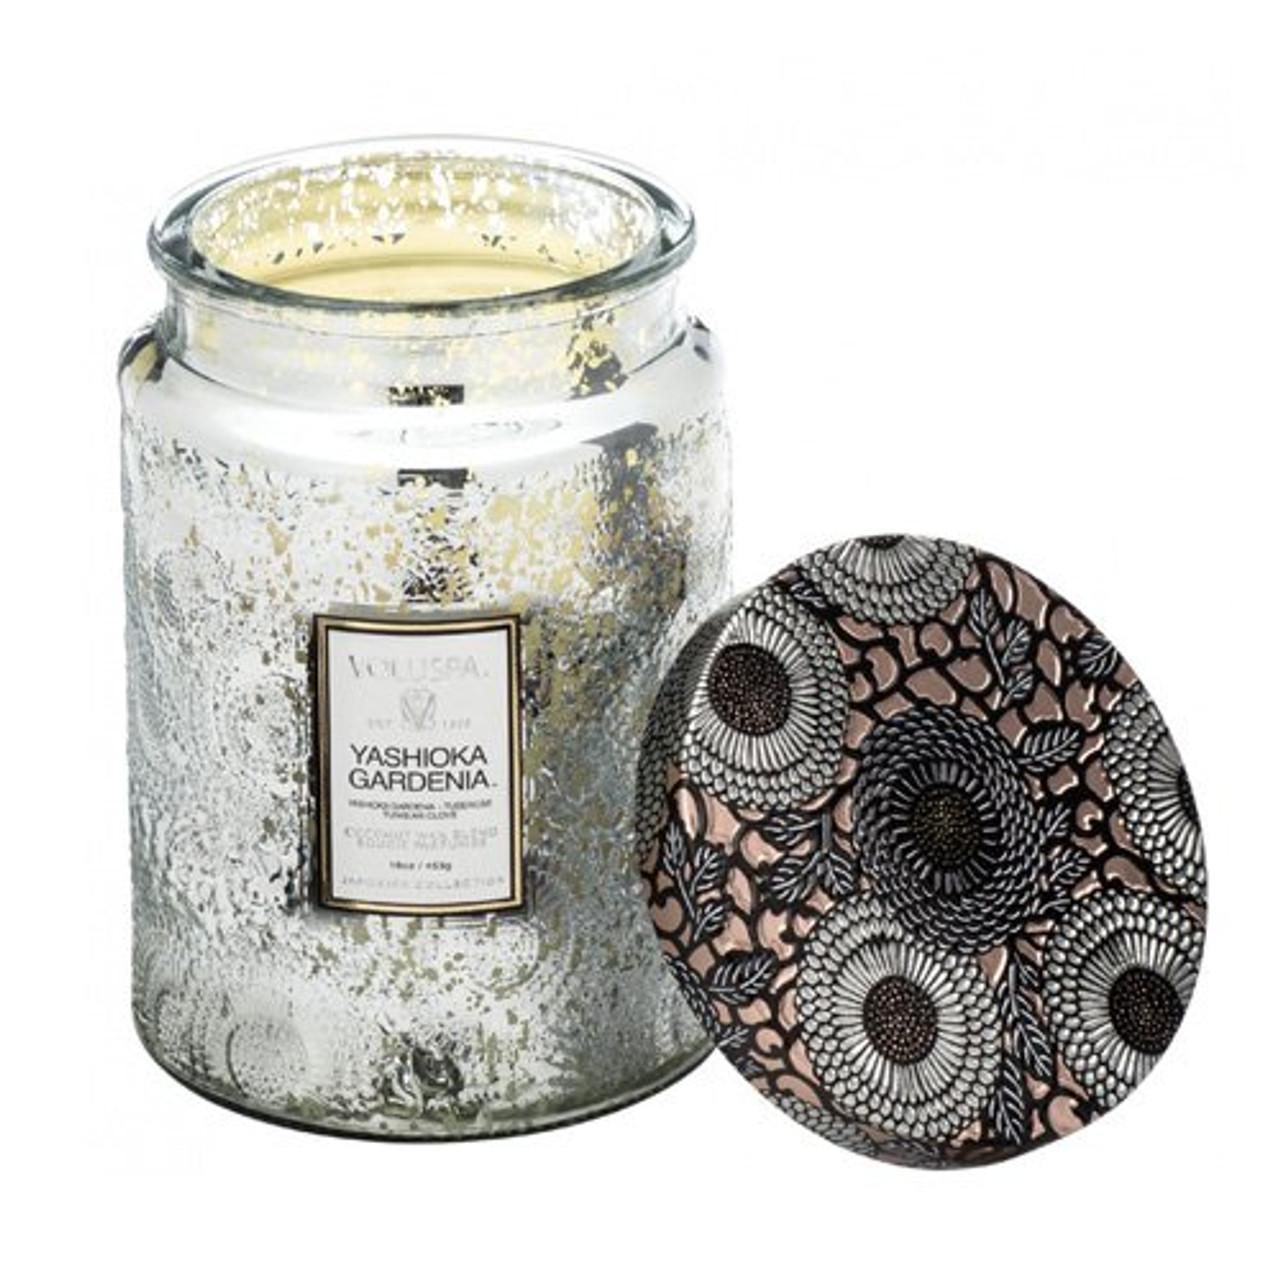 Voluspa Yashioka Gardenia Large Embossed Glass Jar Candle, 16 Ounces